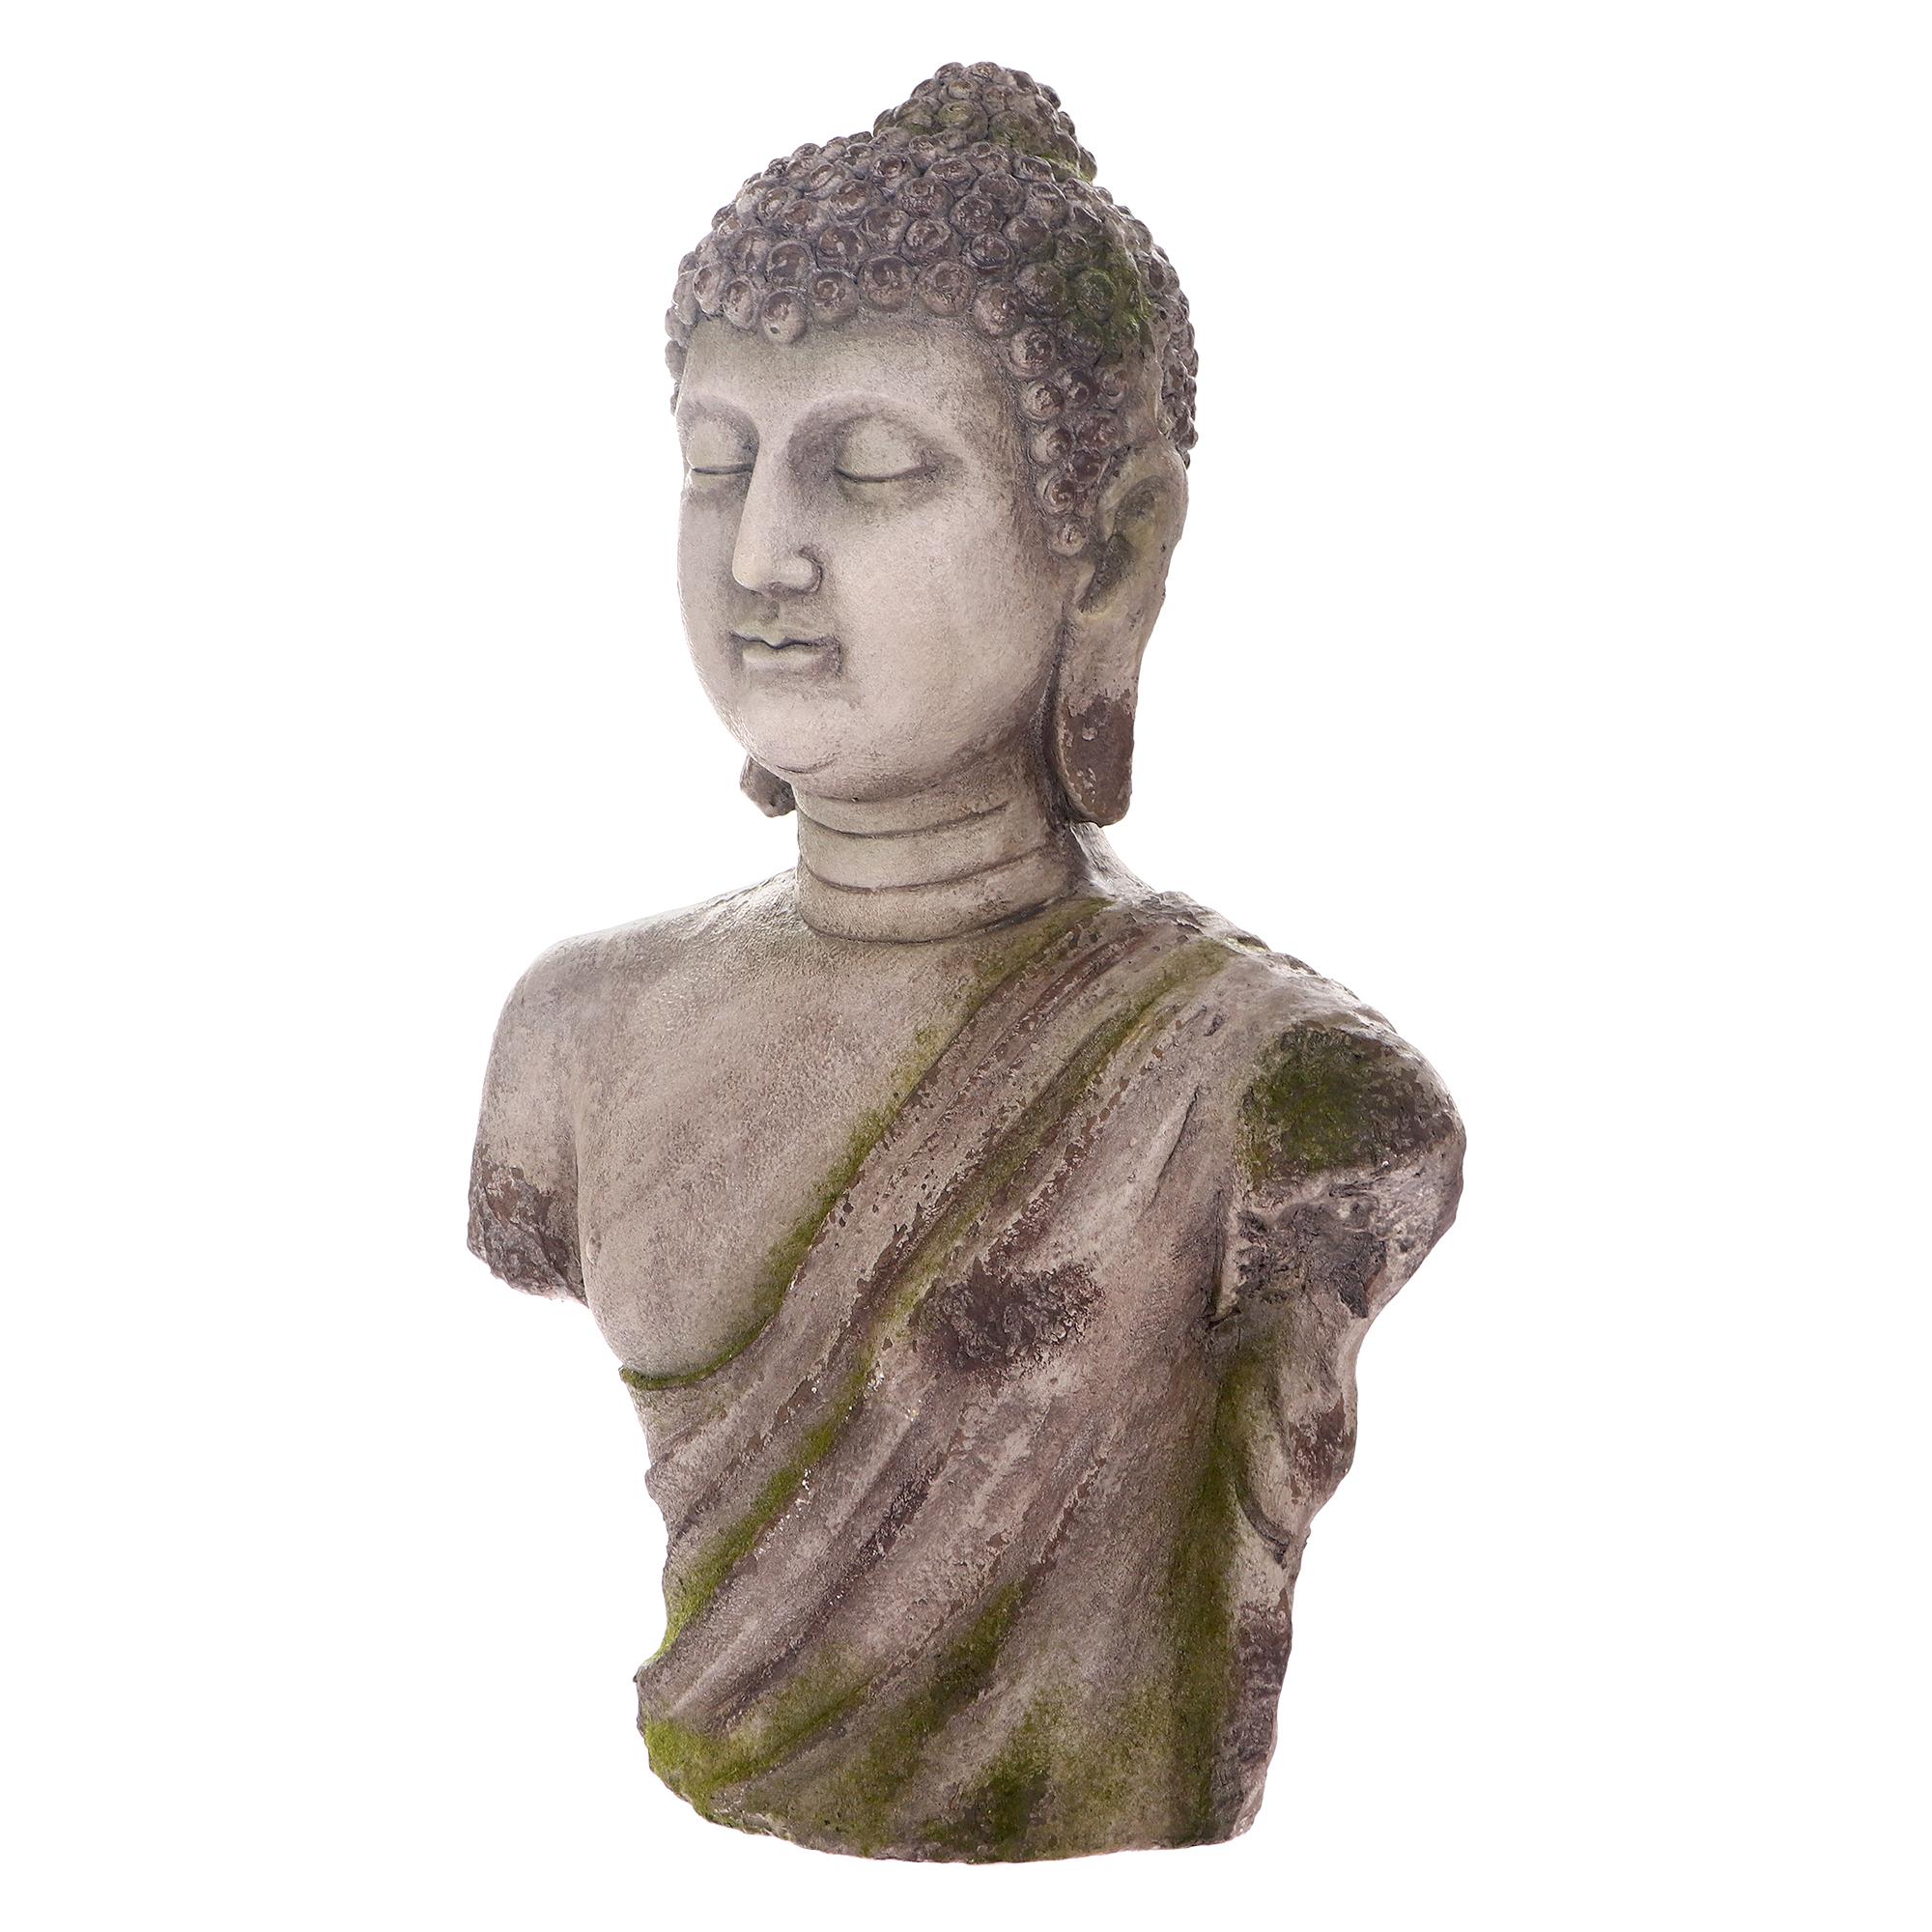 Фото - Фигура садовая декоративная Dingsheng Будда 47x25x70 см фигура садовая декоративная dingsheng будда 47x25x70 см